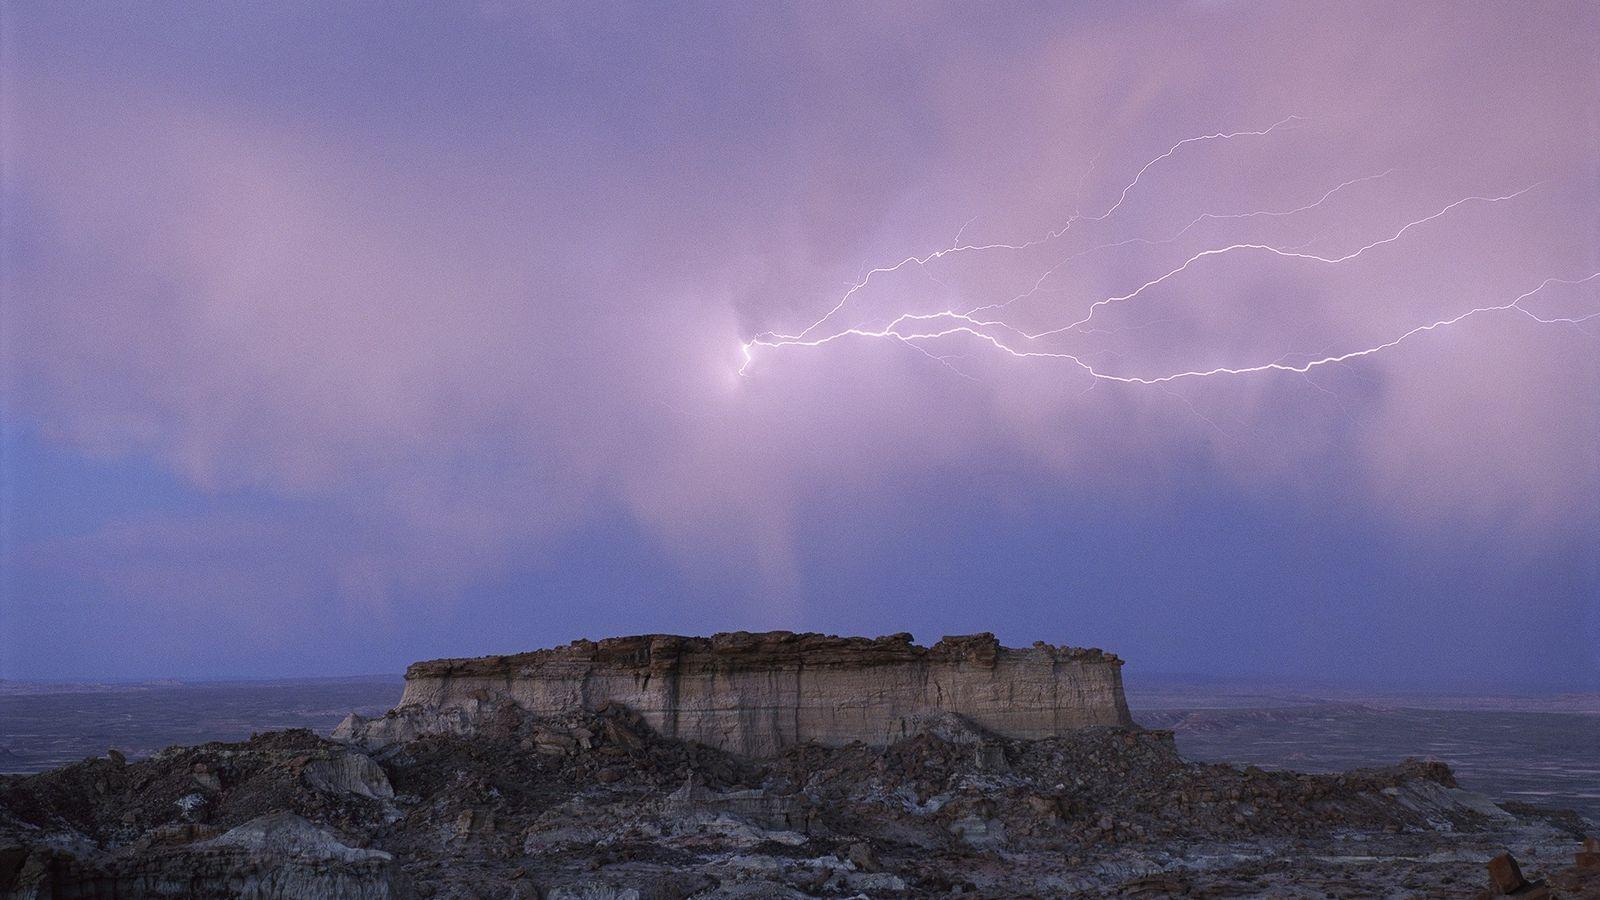 10_epic_summer_storms_lightning